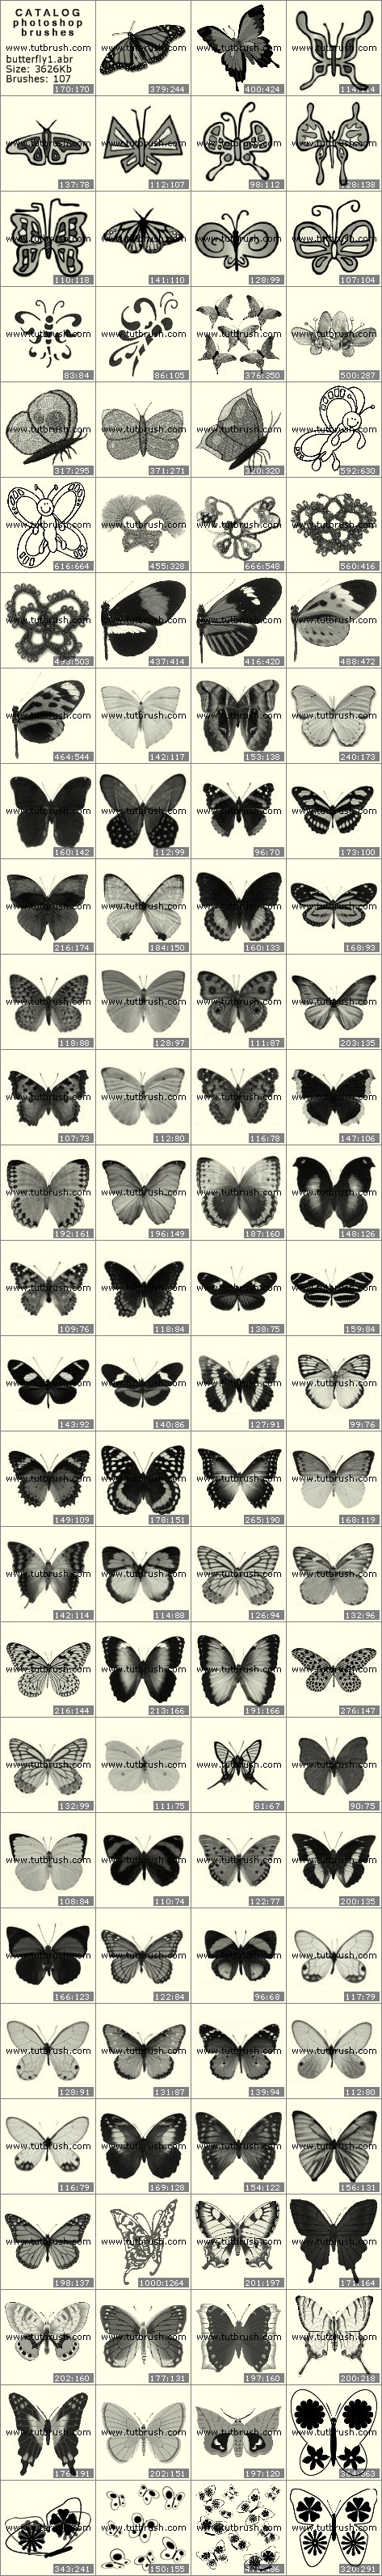 Кисти для фотошопа коллекция бабочек